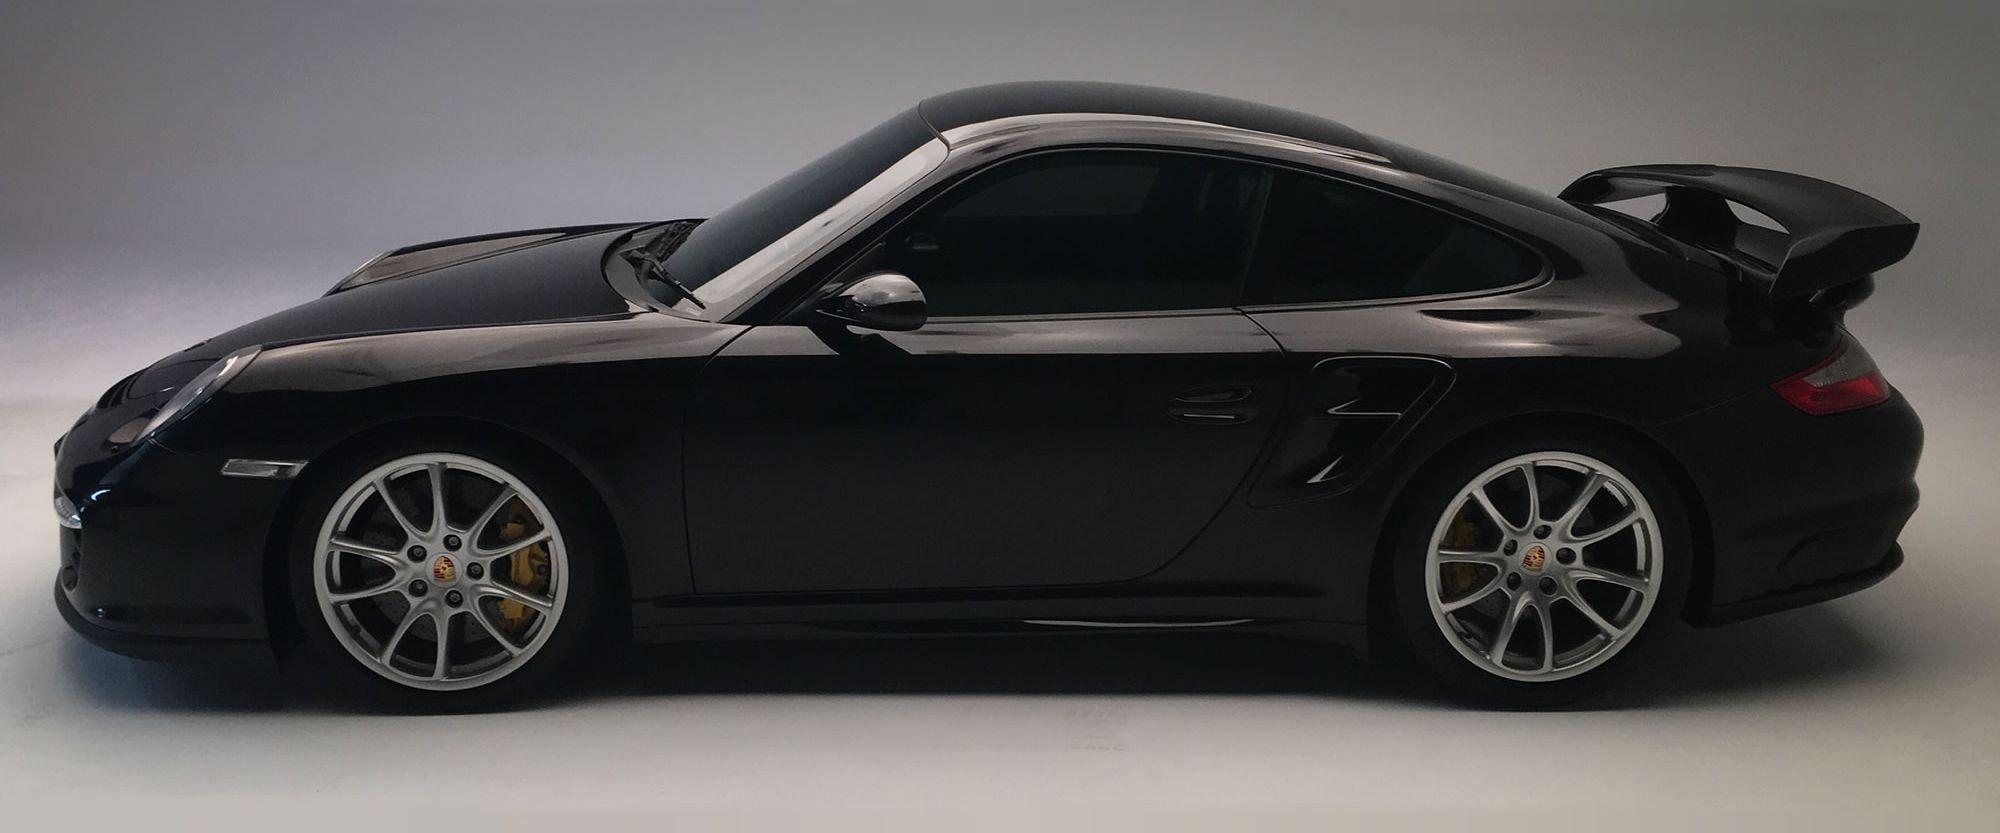 Black Porsche2